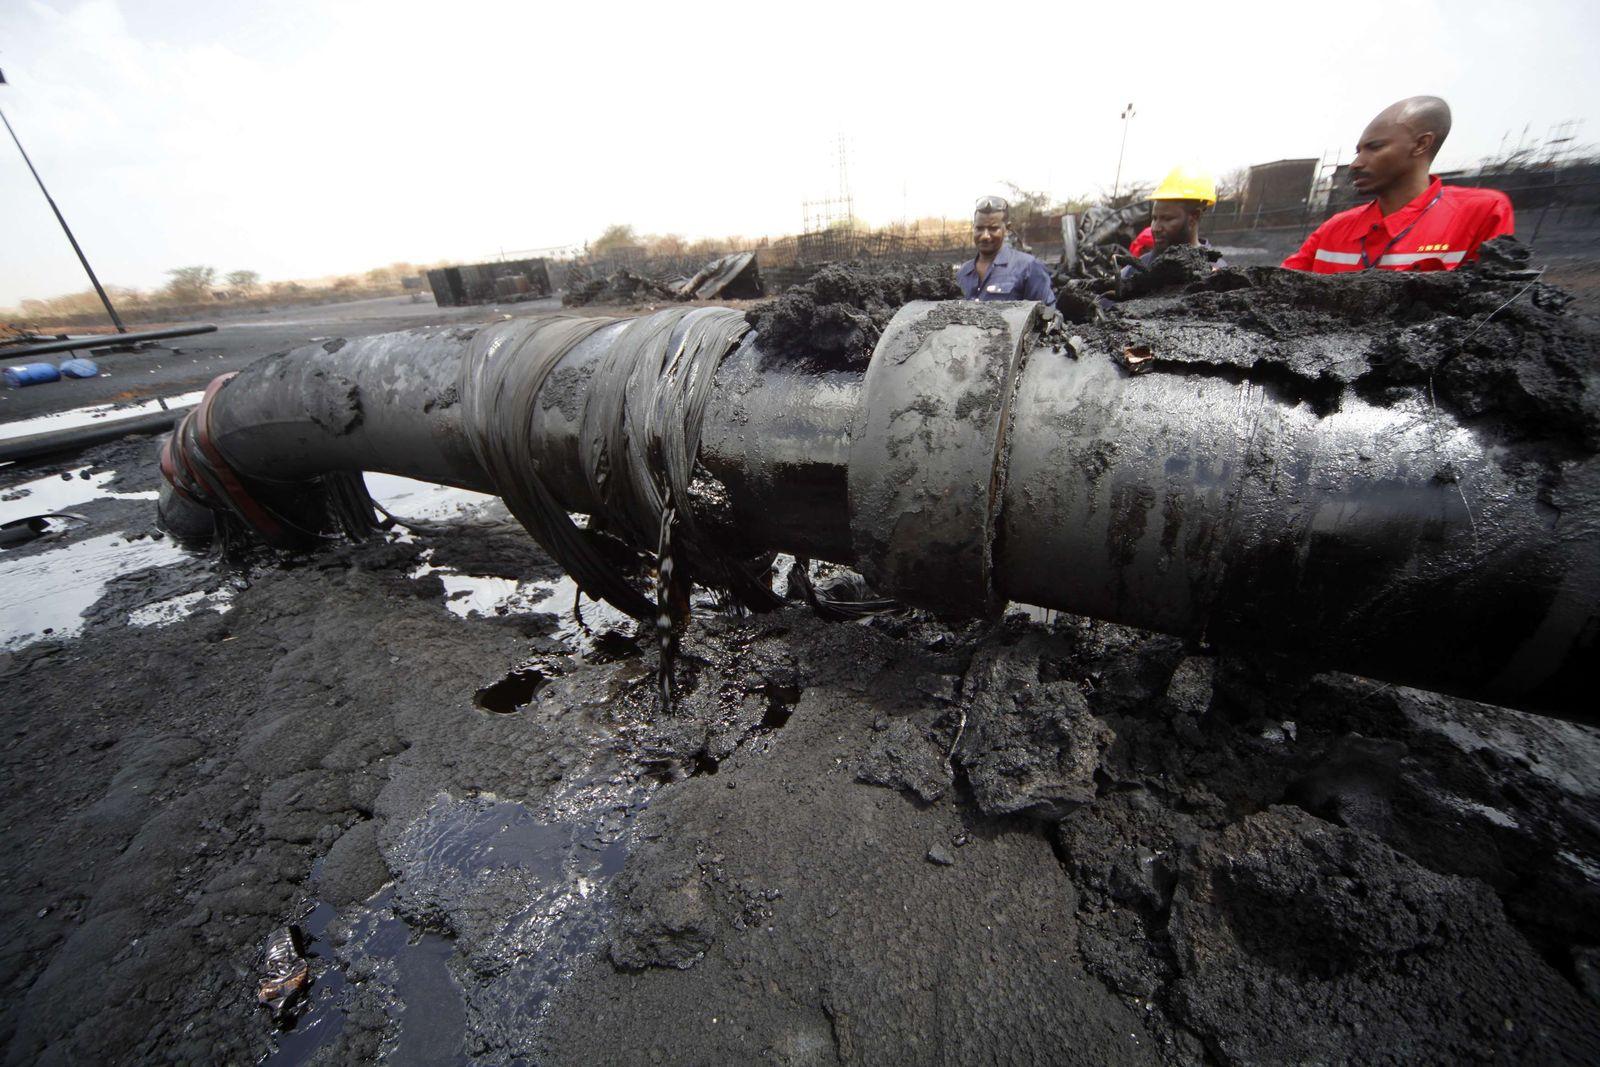 Sudan/ Öl/ Heglig Pipeline